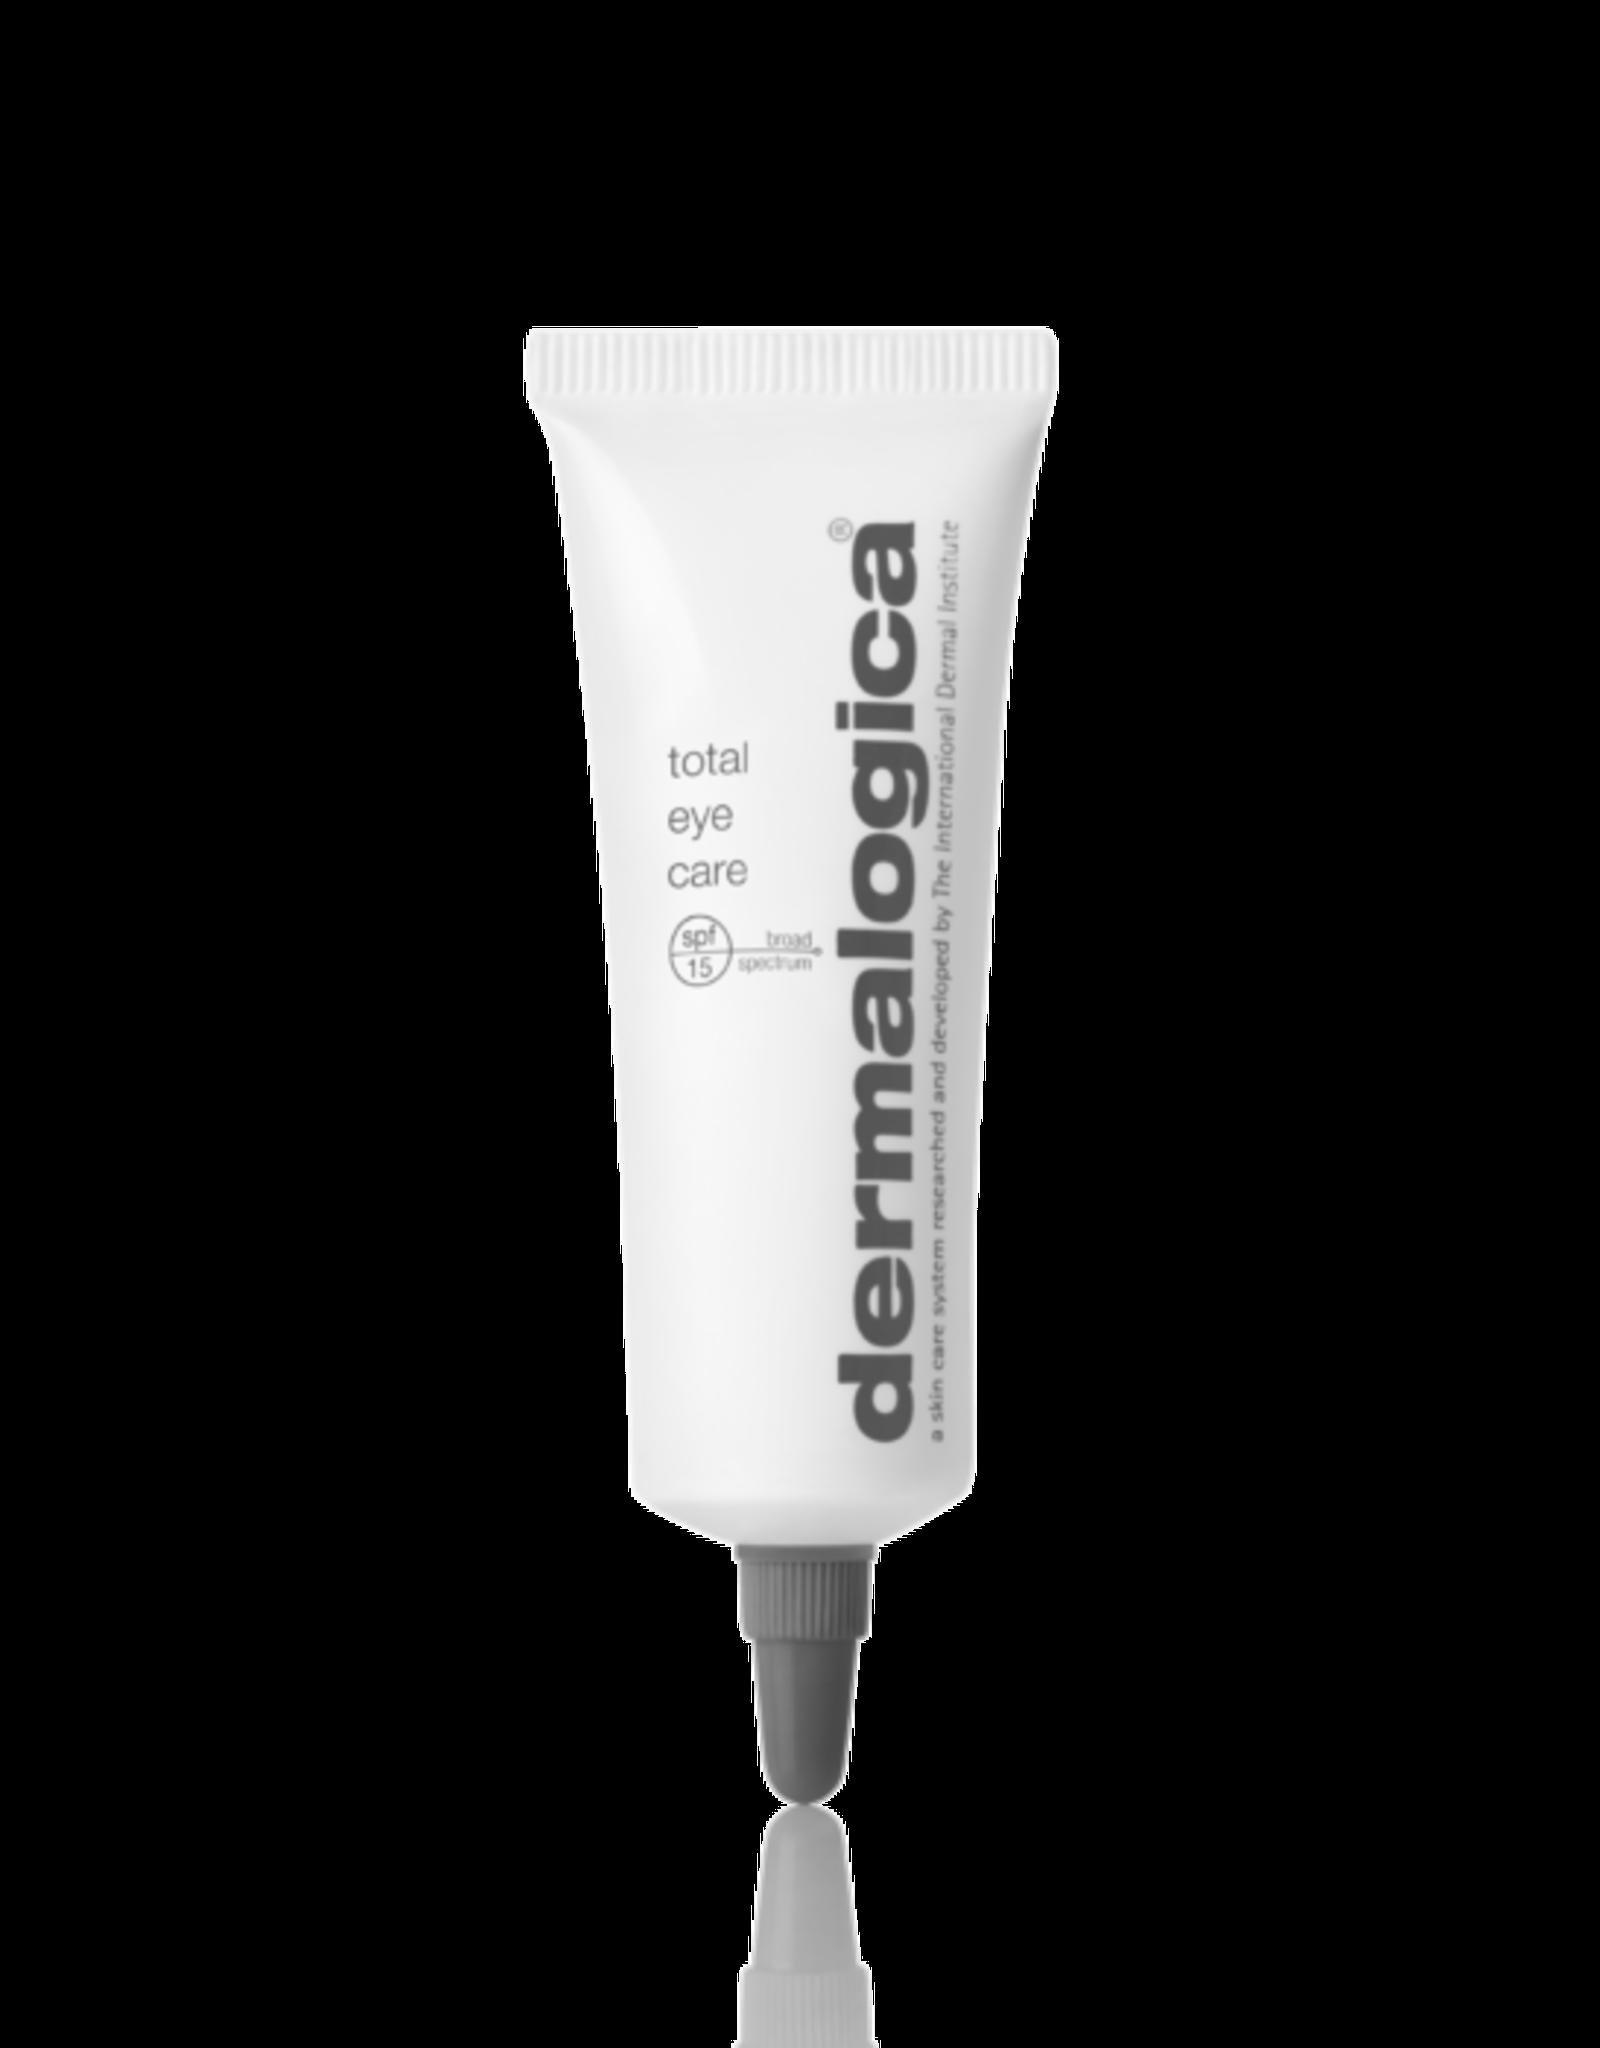 Dermalogica Total Eye Care 15ml - Dermalogica